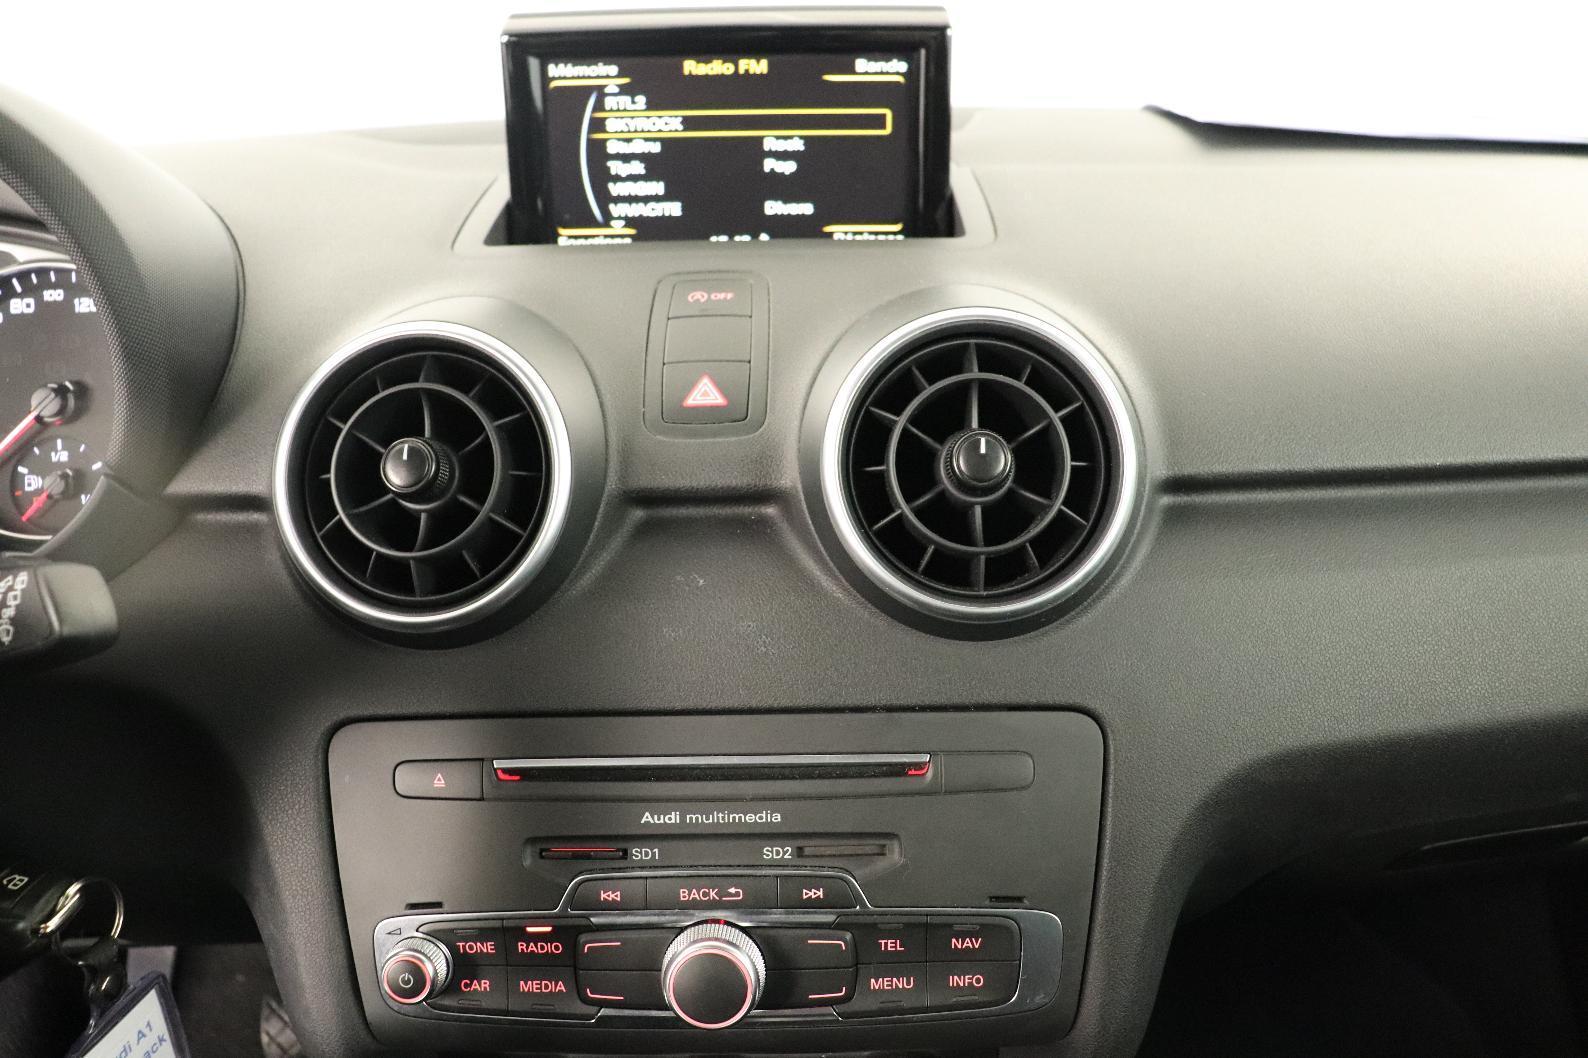 AUDI A1 SPORTBACK A1 Sportback 1.4 TFSI 125 BVM6